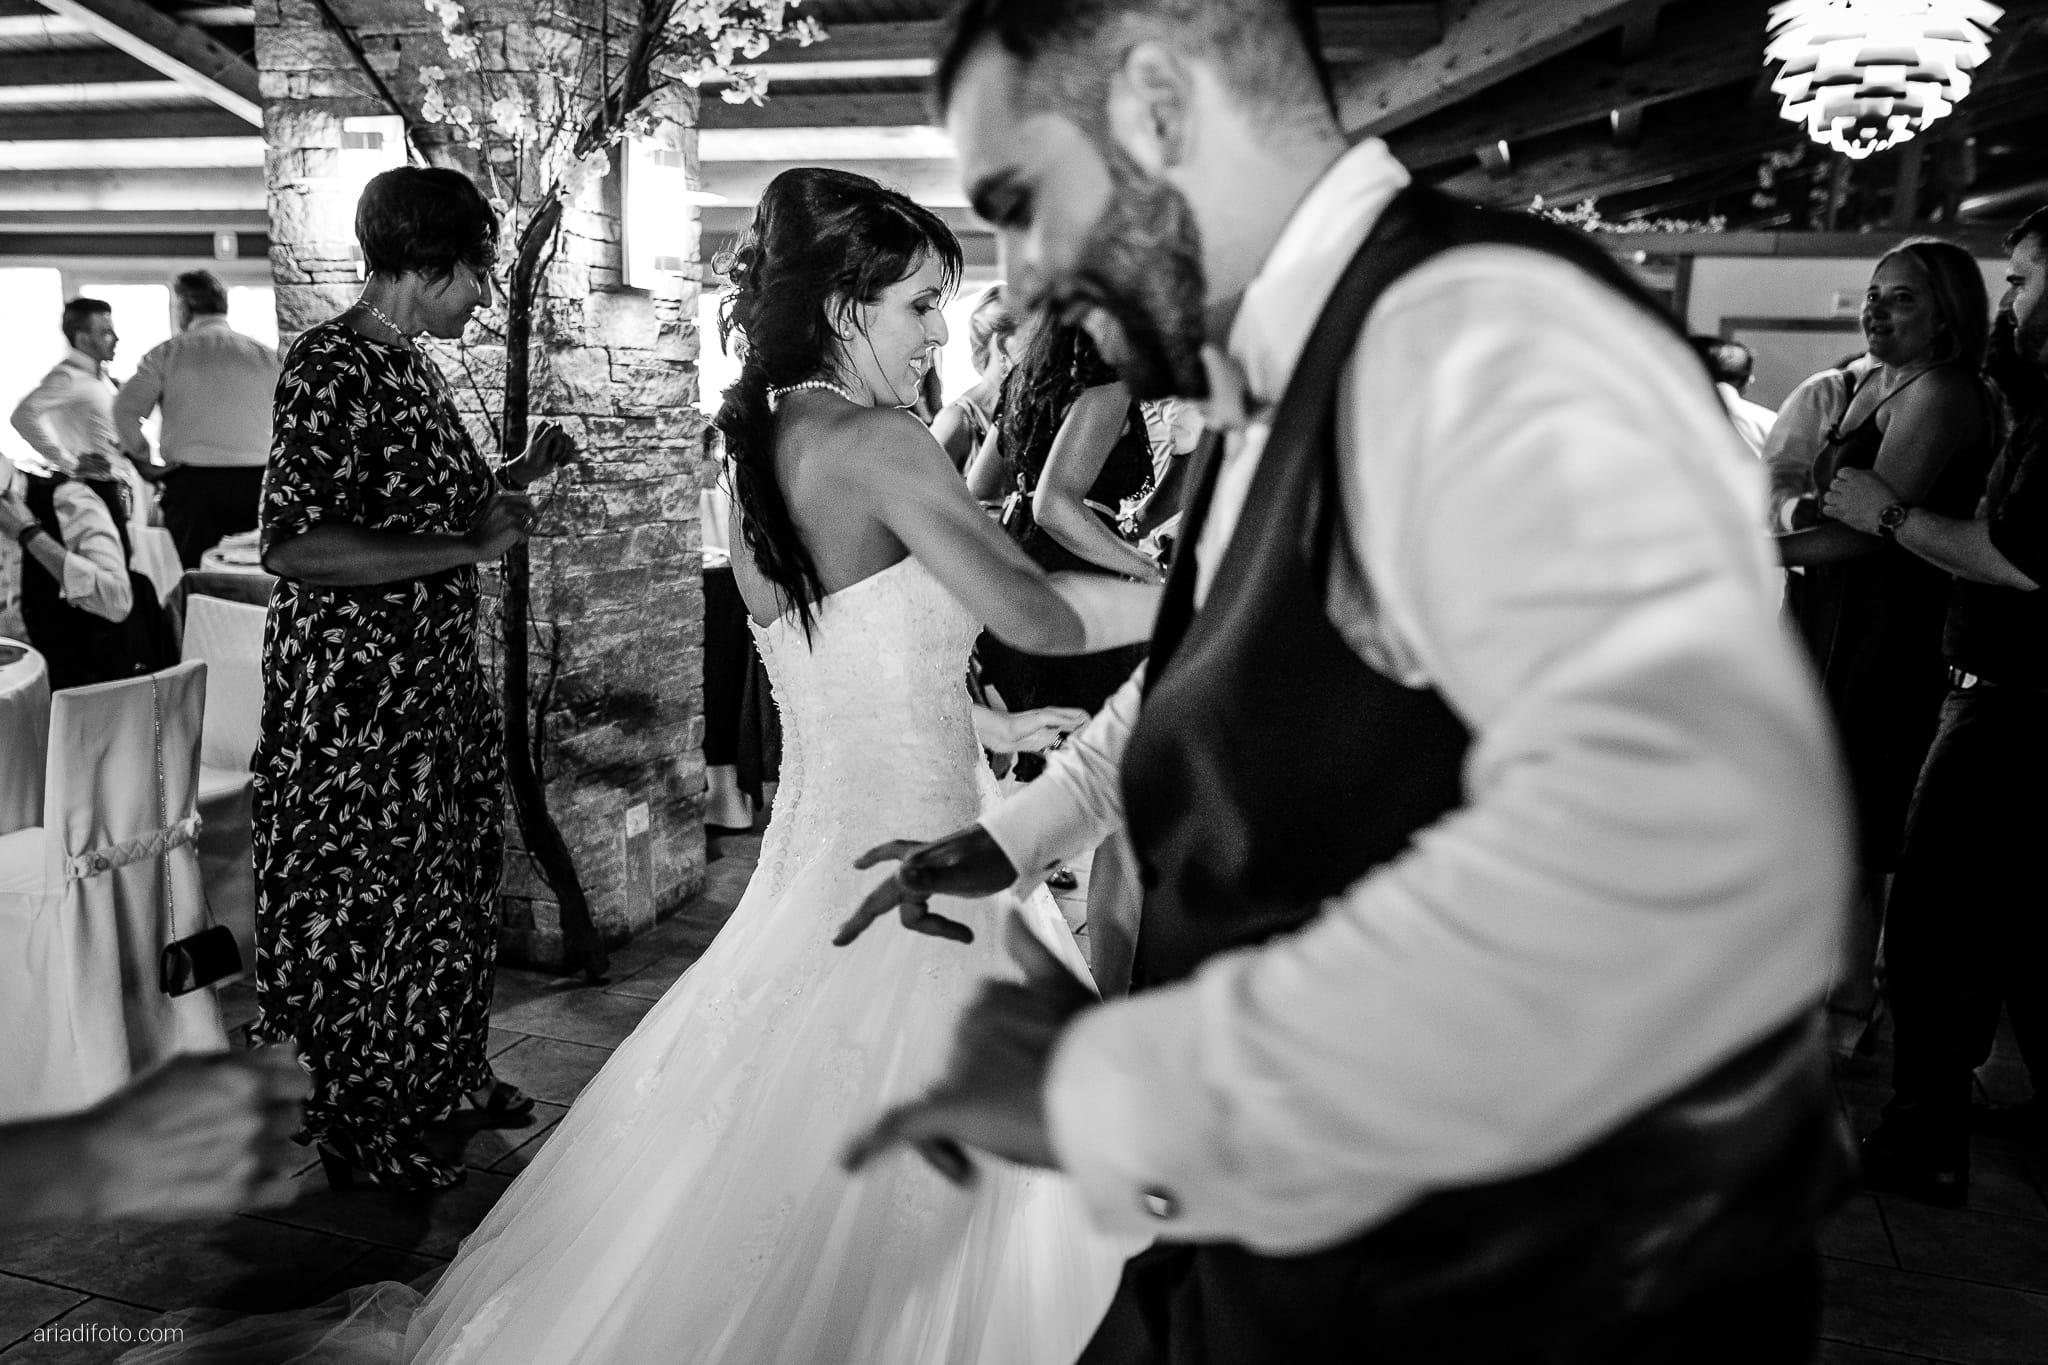 Rosylenia Luca Matrimonio Duino Ristorante Napoleone Castions Udine ricevimento balli